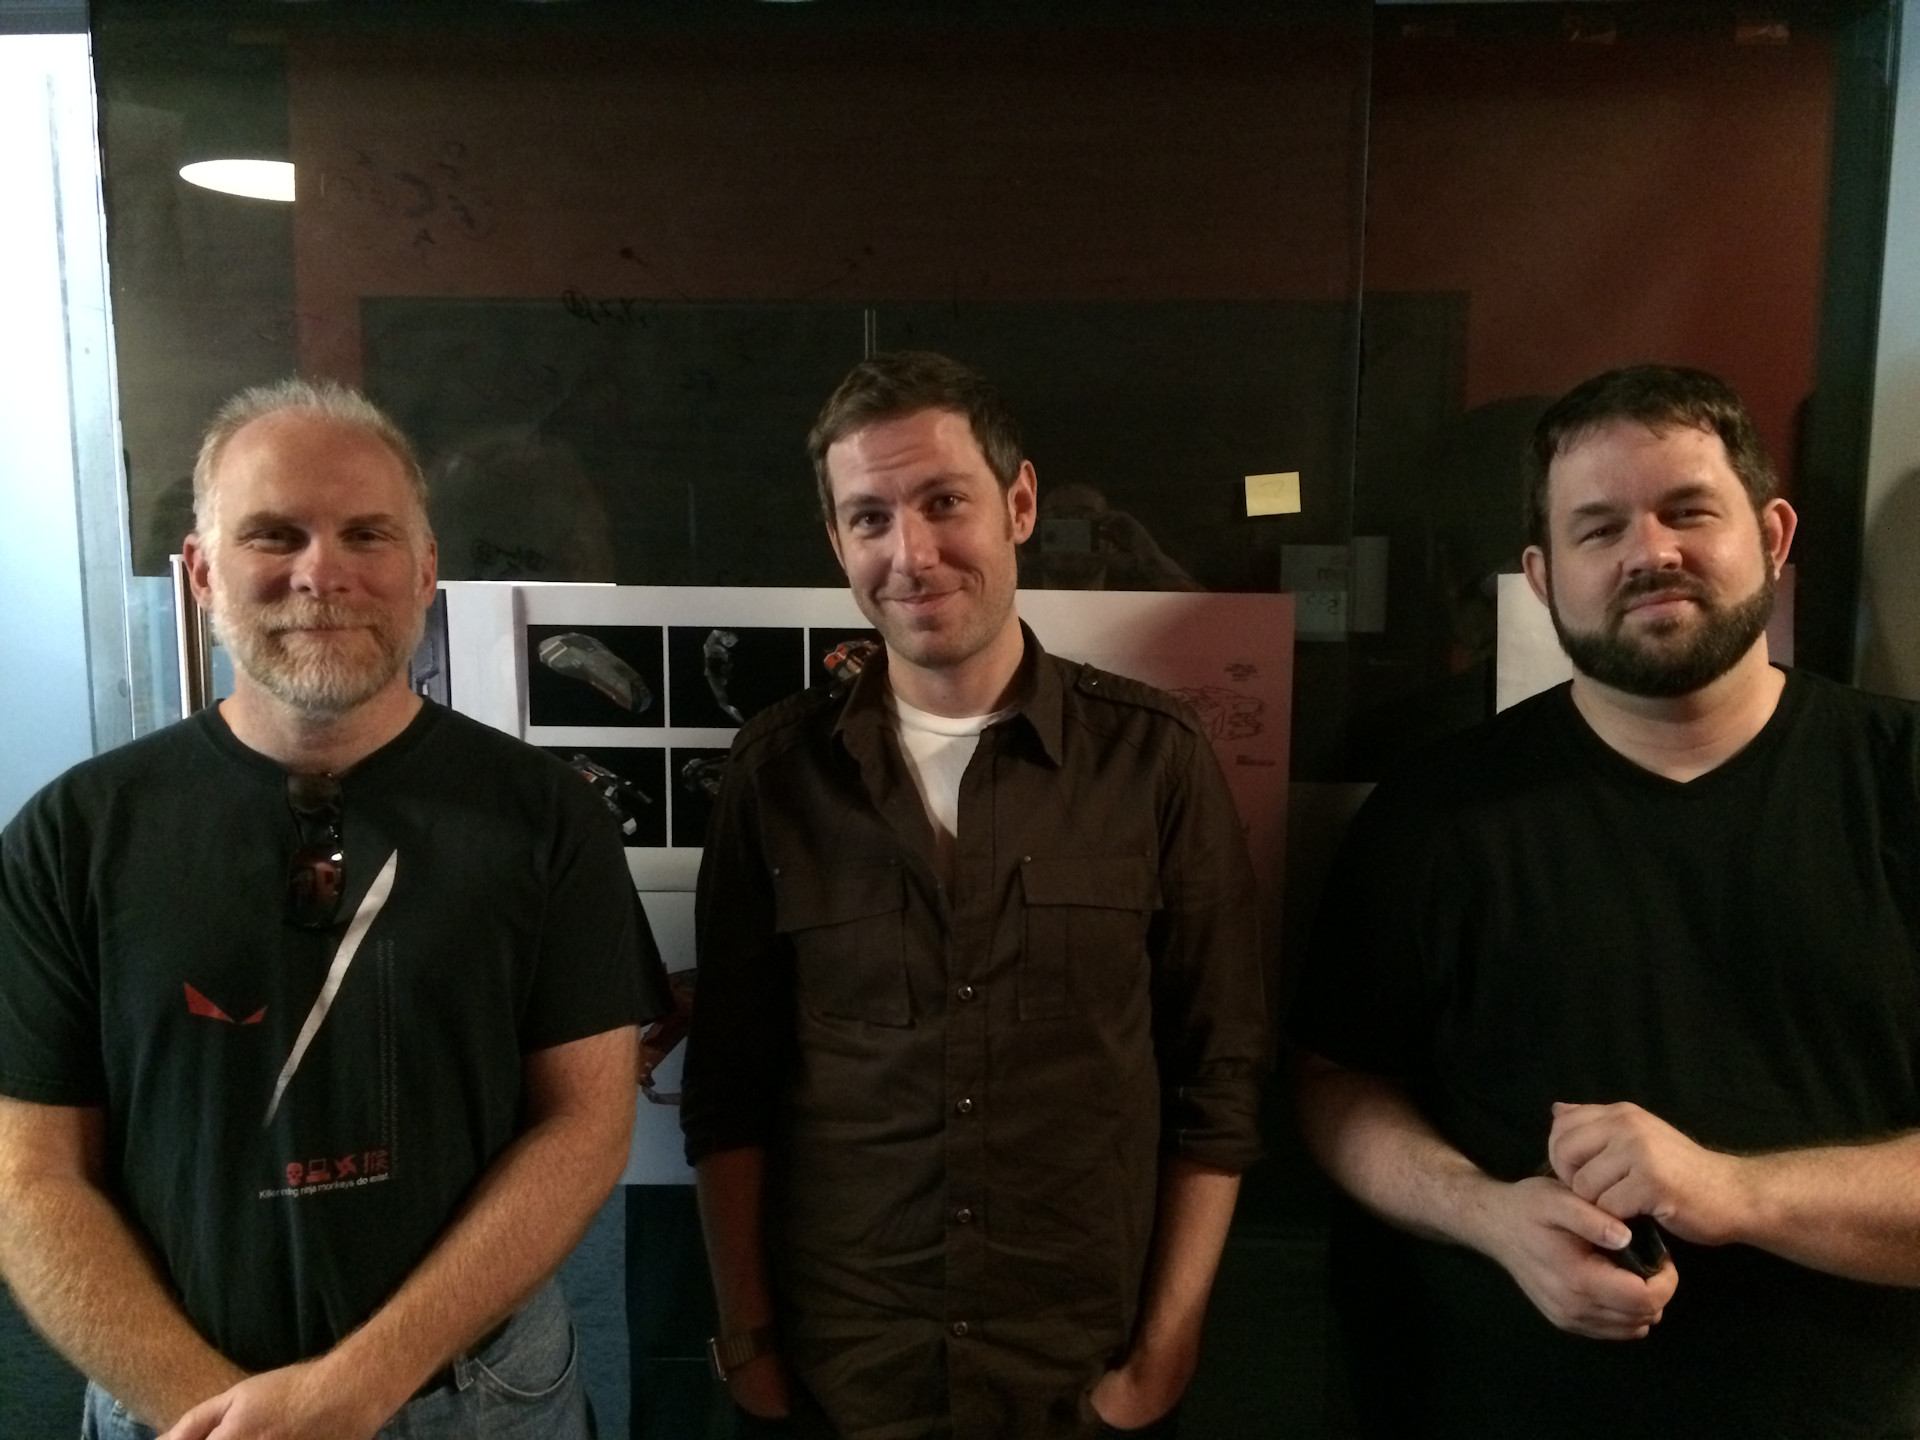 Gearbox Homeworld Team - Patrick Brian Dave